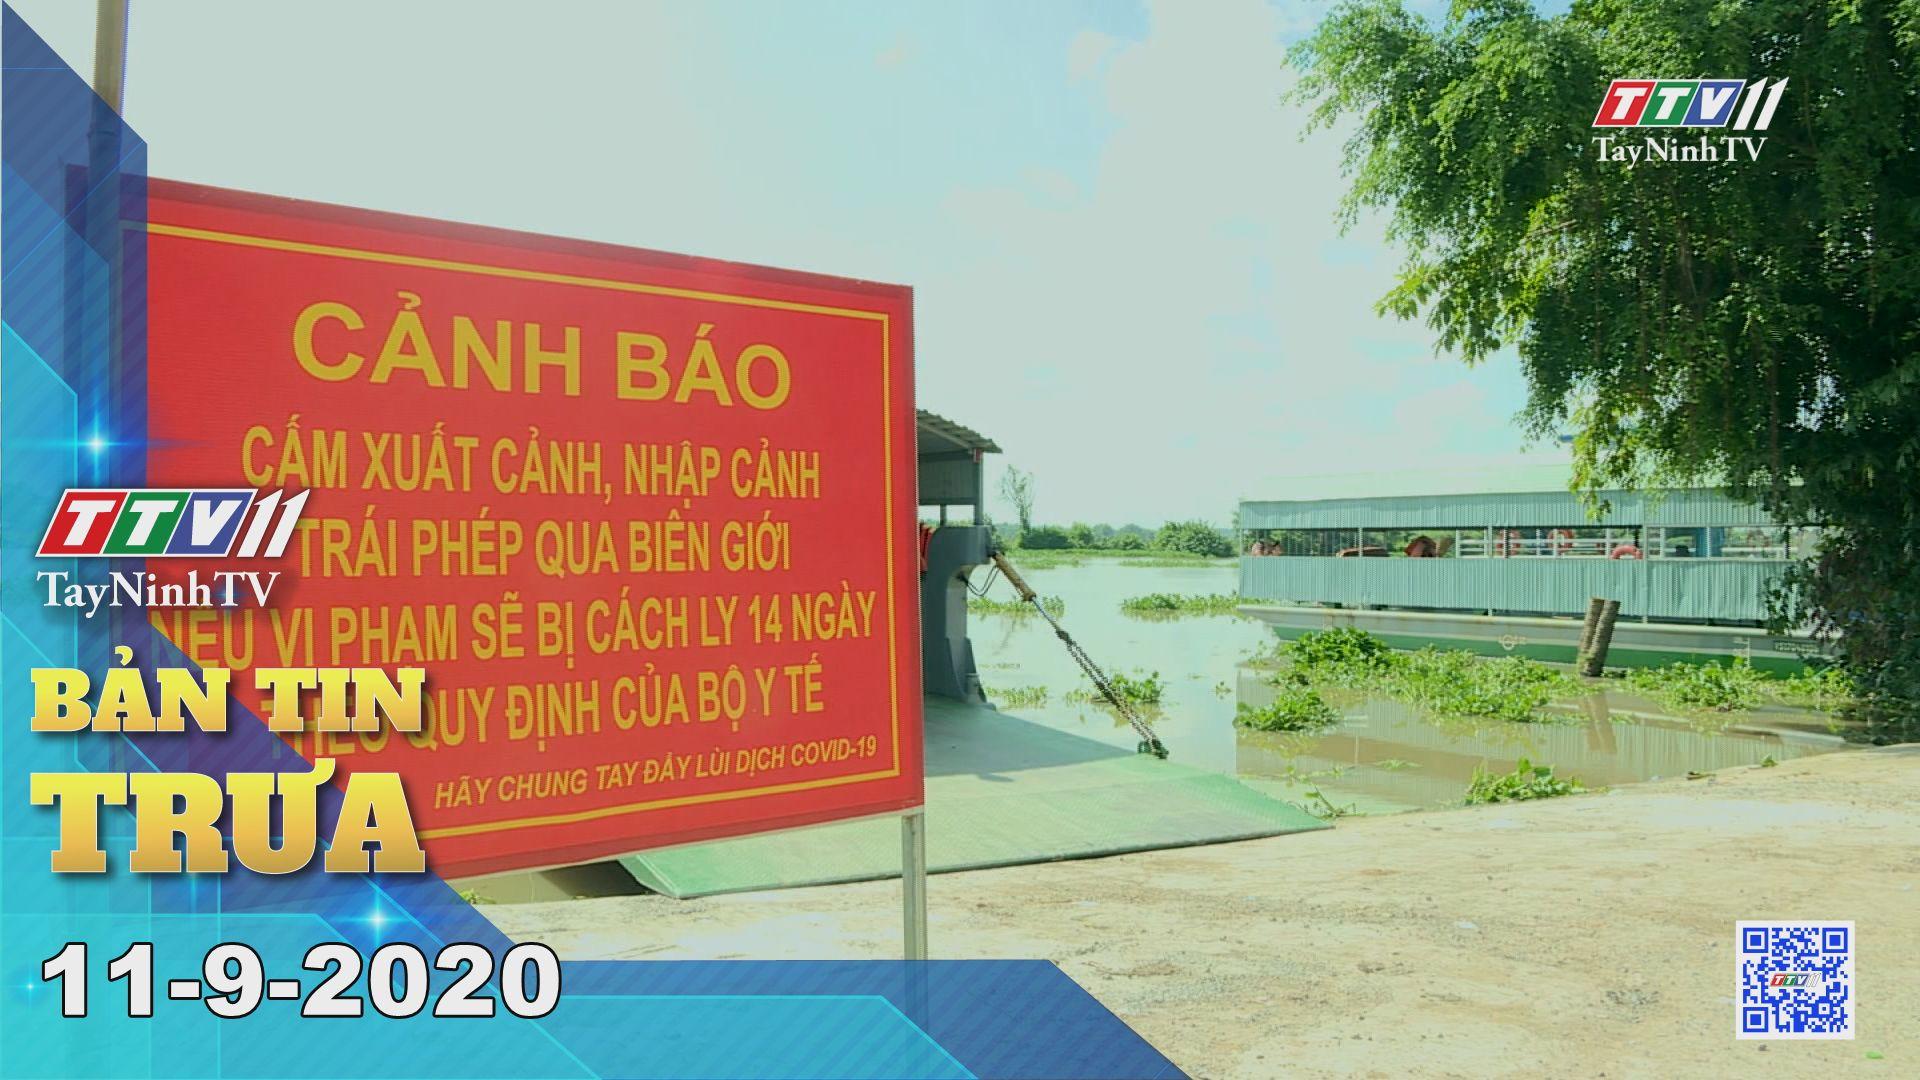 Bản tin trưa 11-9-2020 | Tin tức hôm nay | TayNinhTV